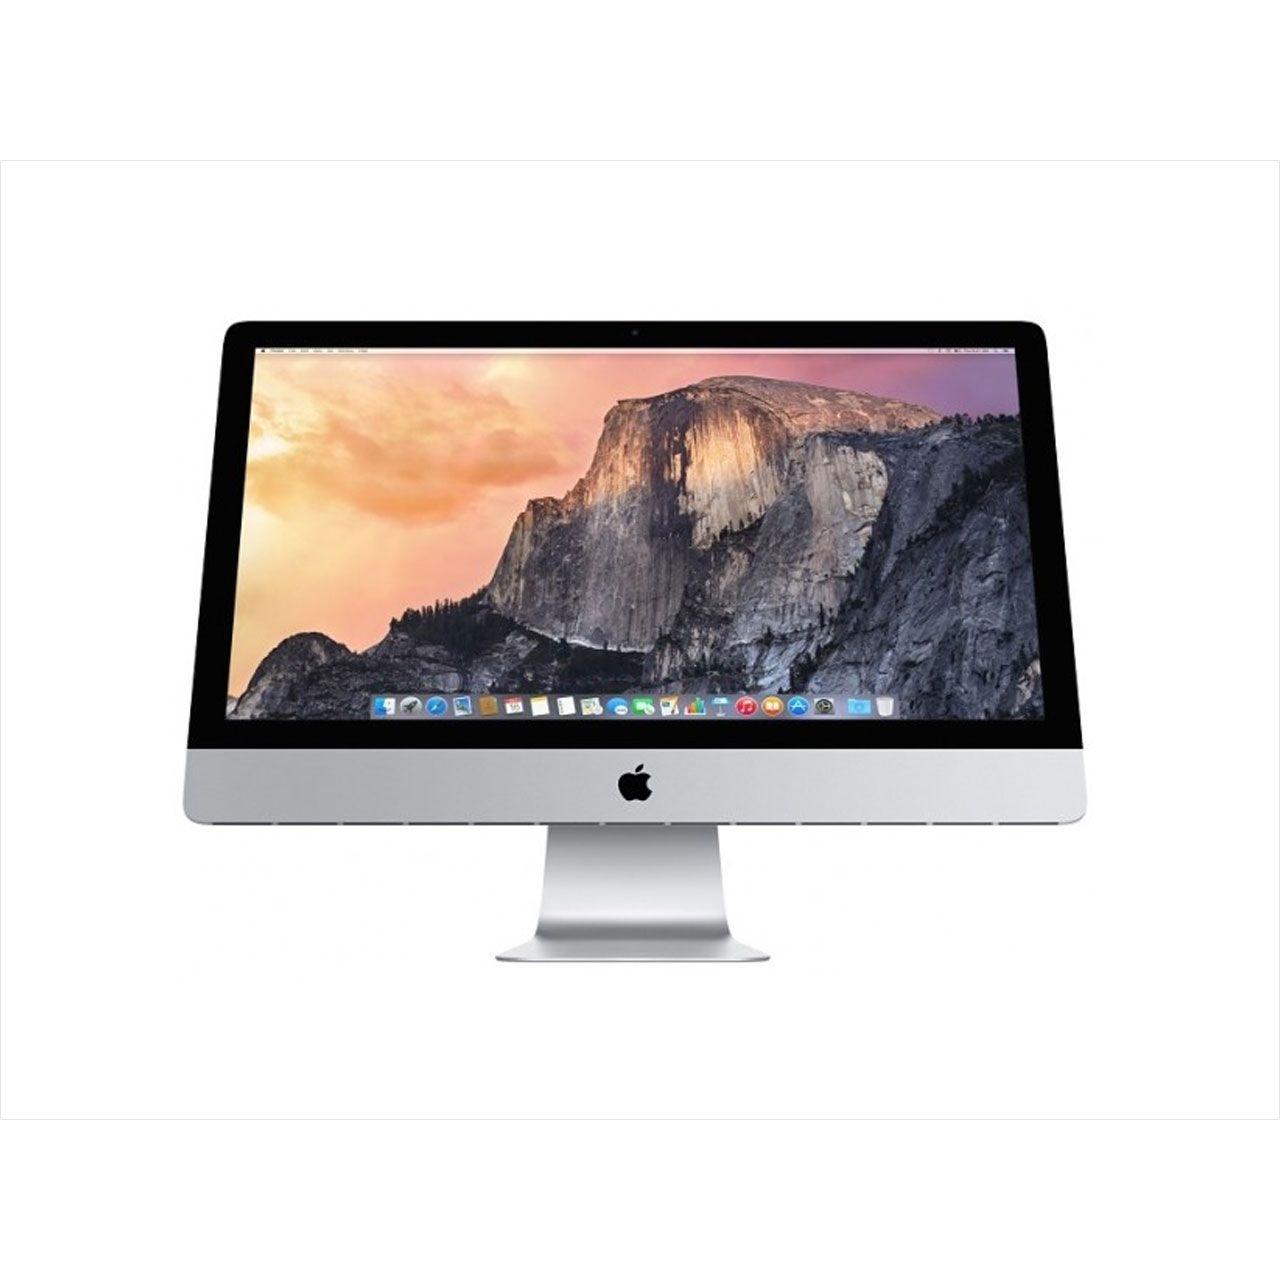 "Apple MC814LL/A Intel Core i5-2400 X4 3.1GHz 4GB 1TB 27"",Silver (Refurbished)"